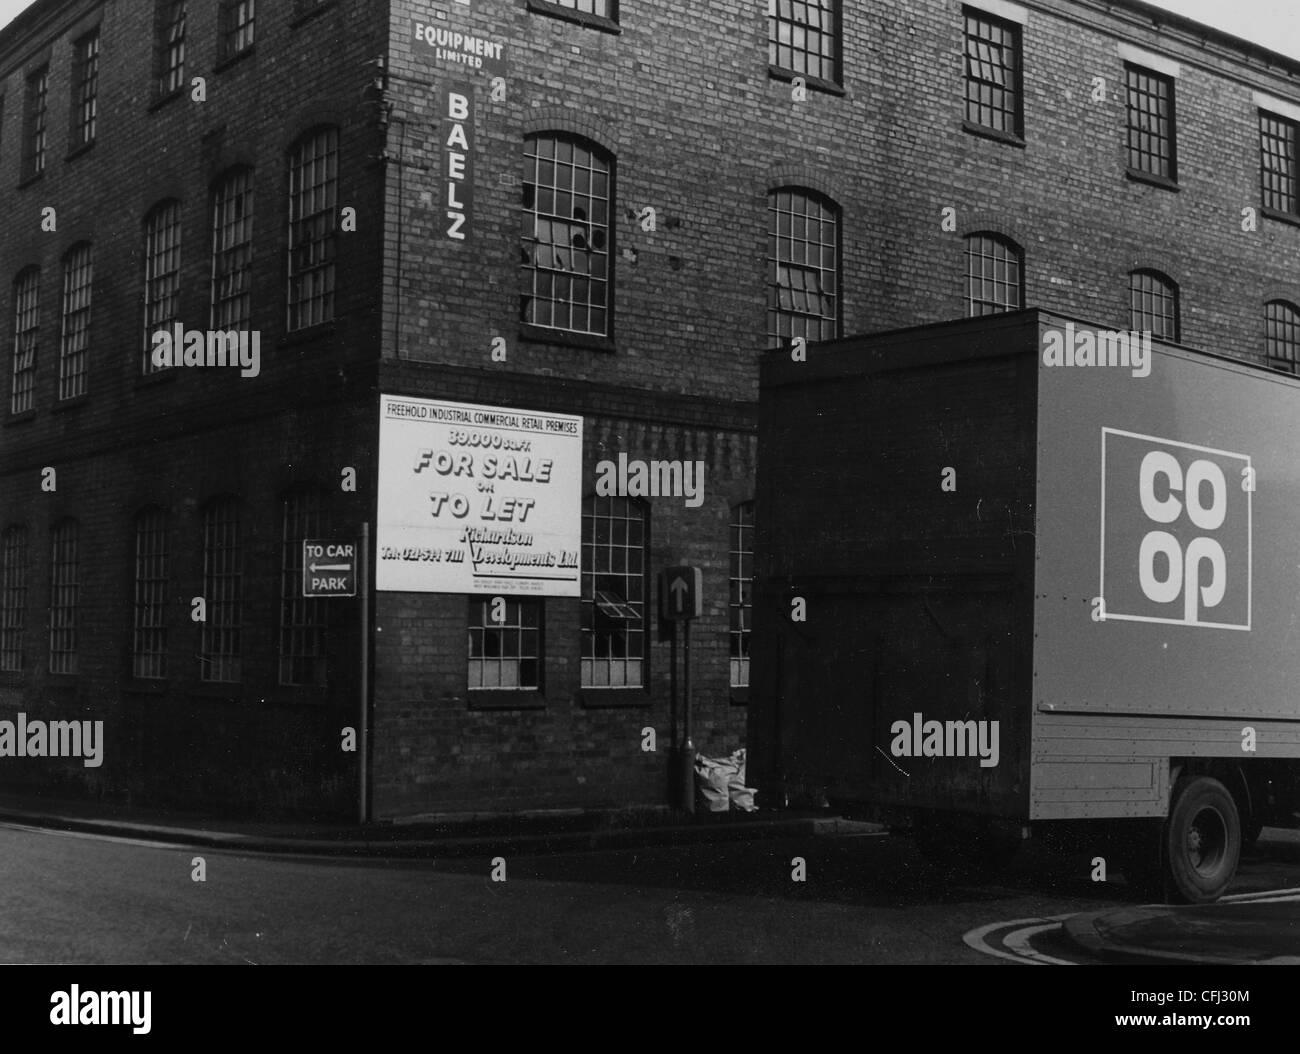 Former Premises, Chubb & Sons Lock & Safe Company Ltd., Wolverhampton, 22 Mar 1982. - Stock Image